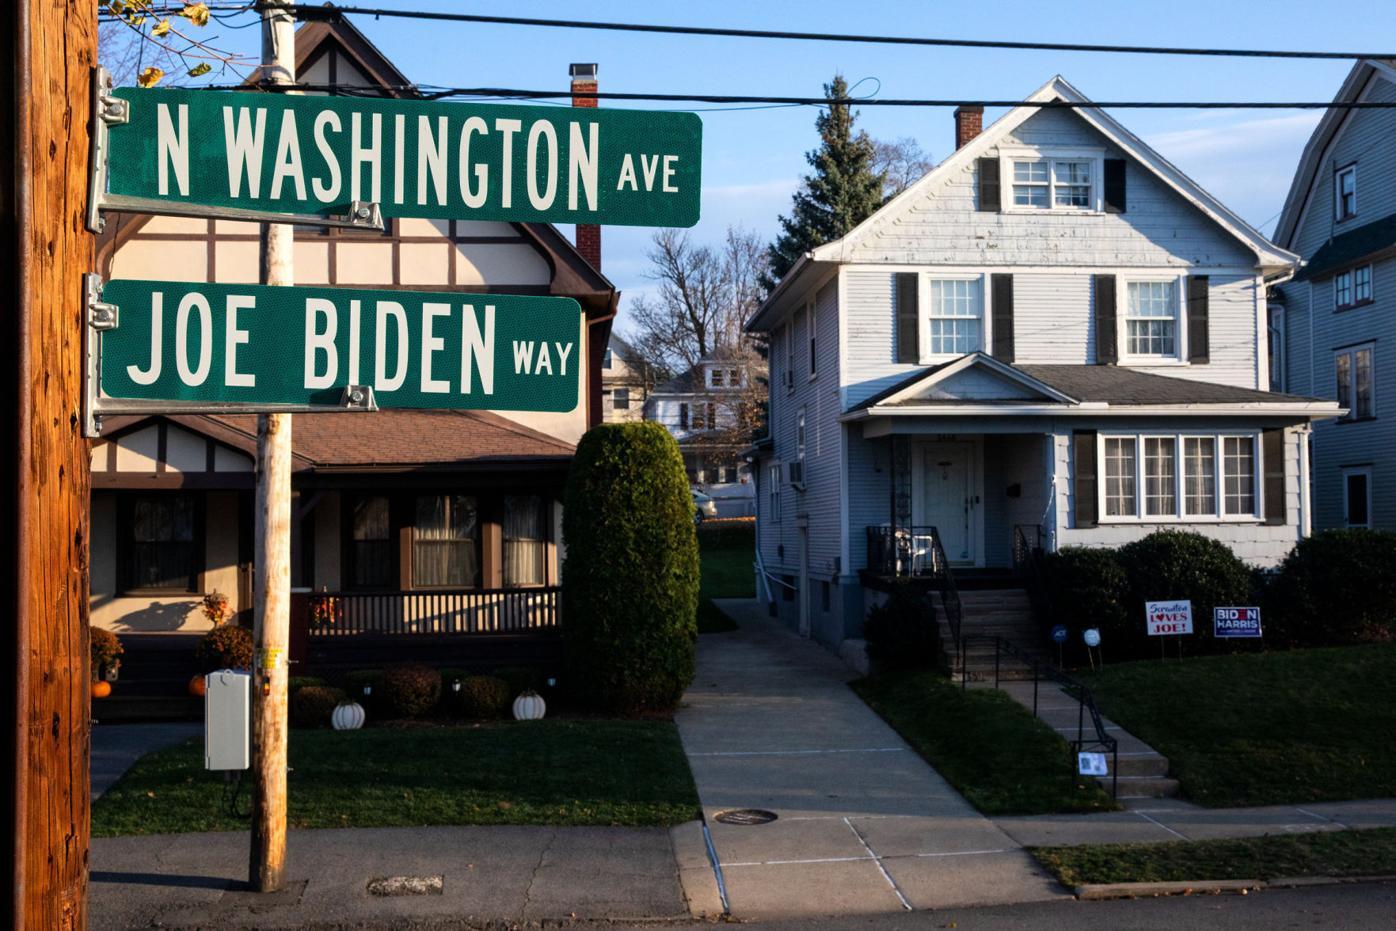 Joe Biden Way